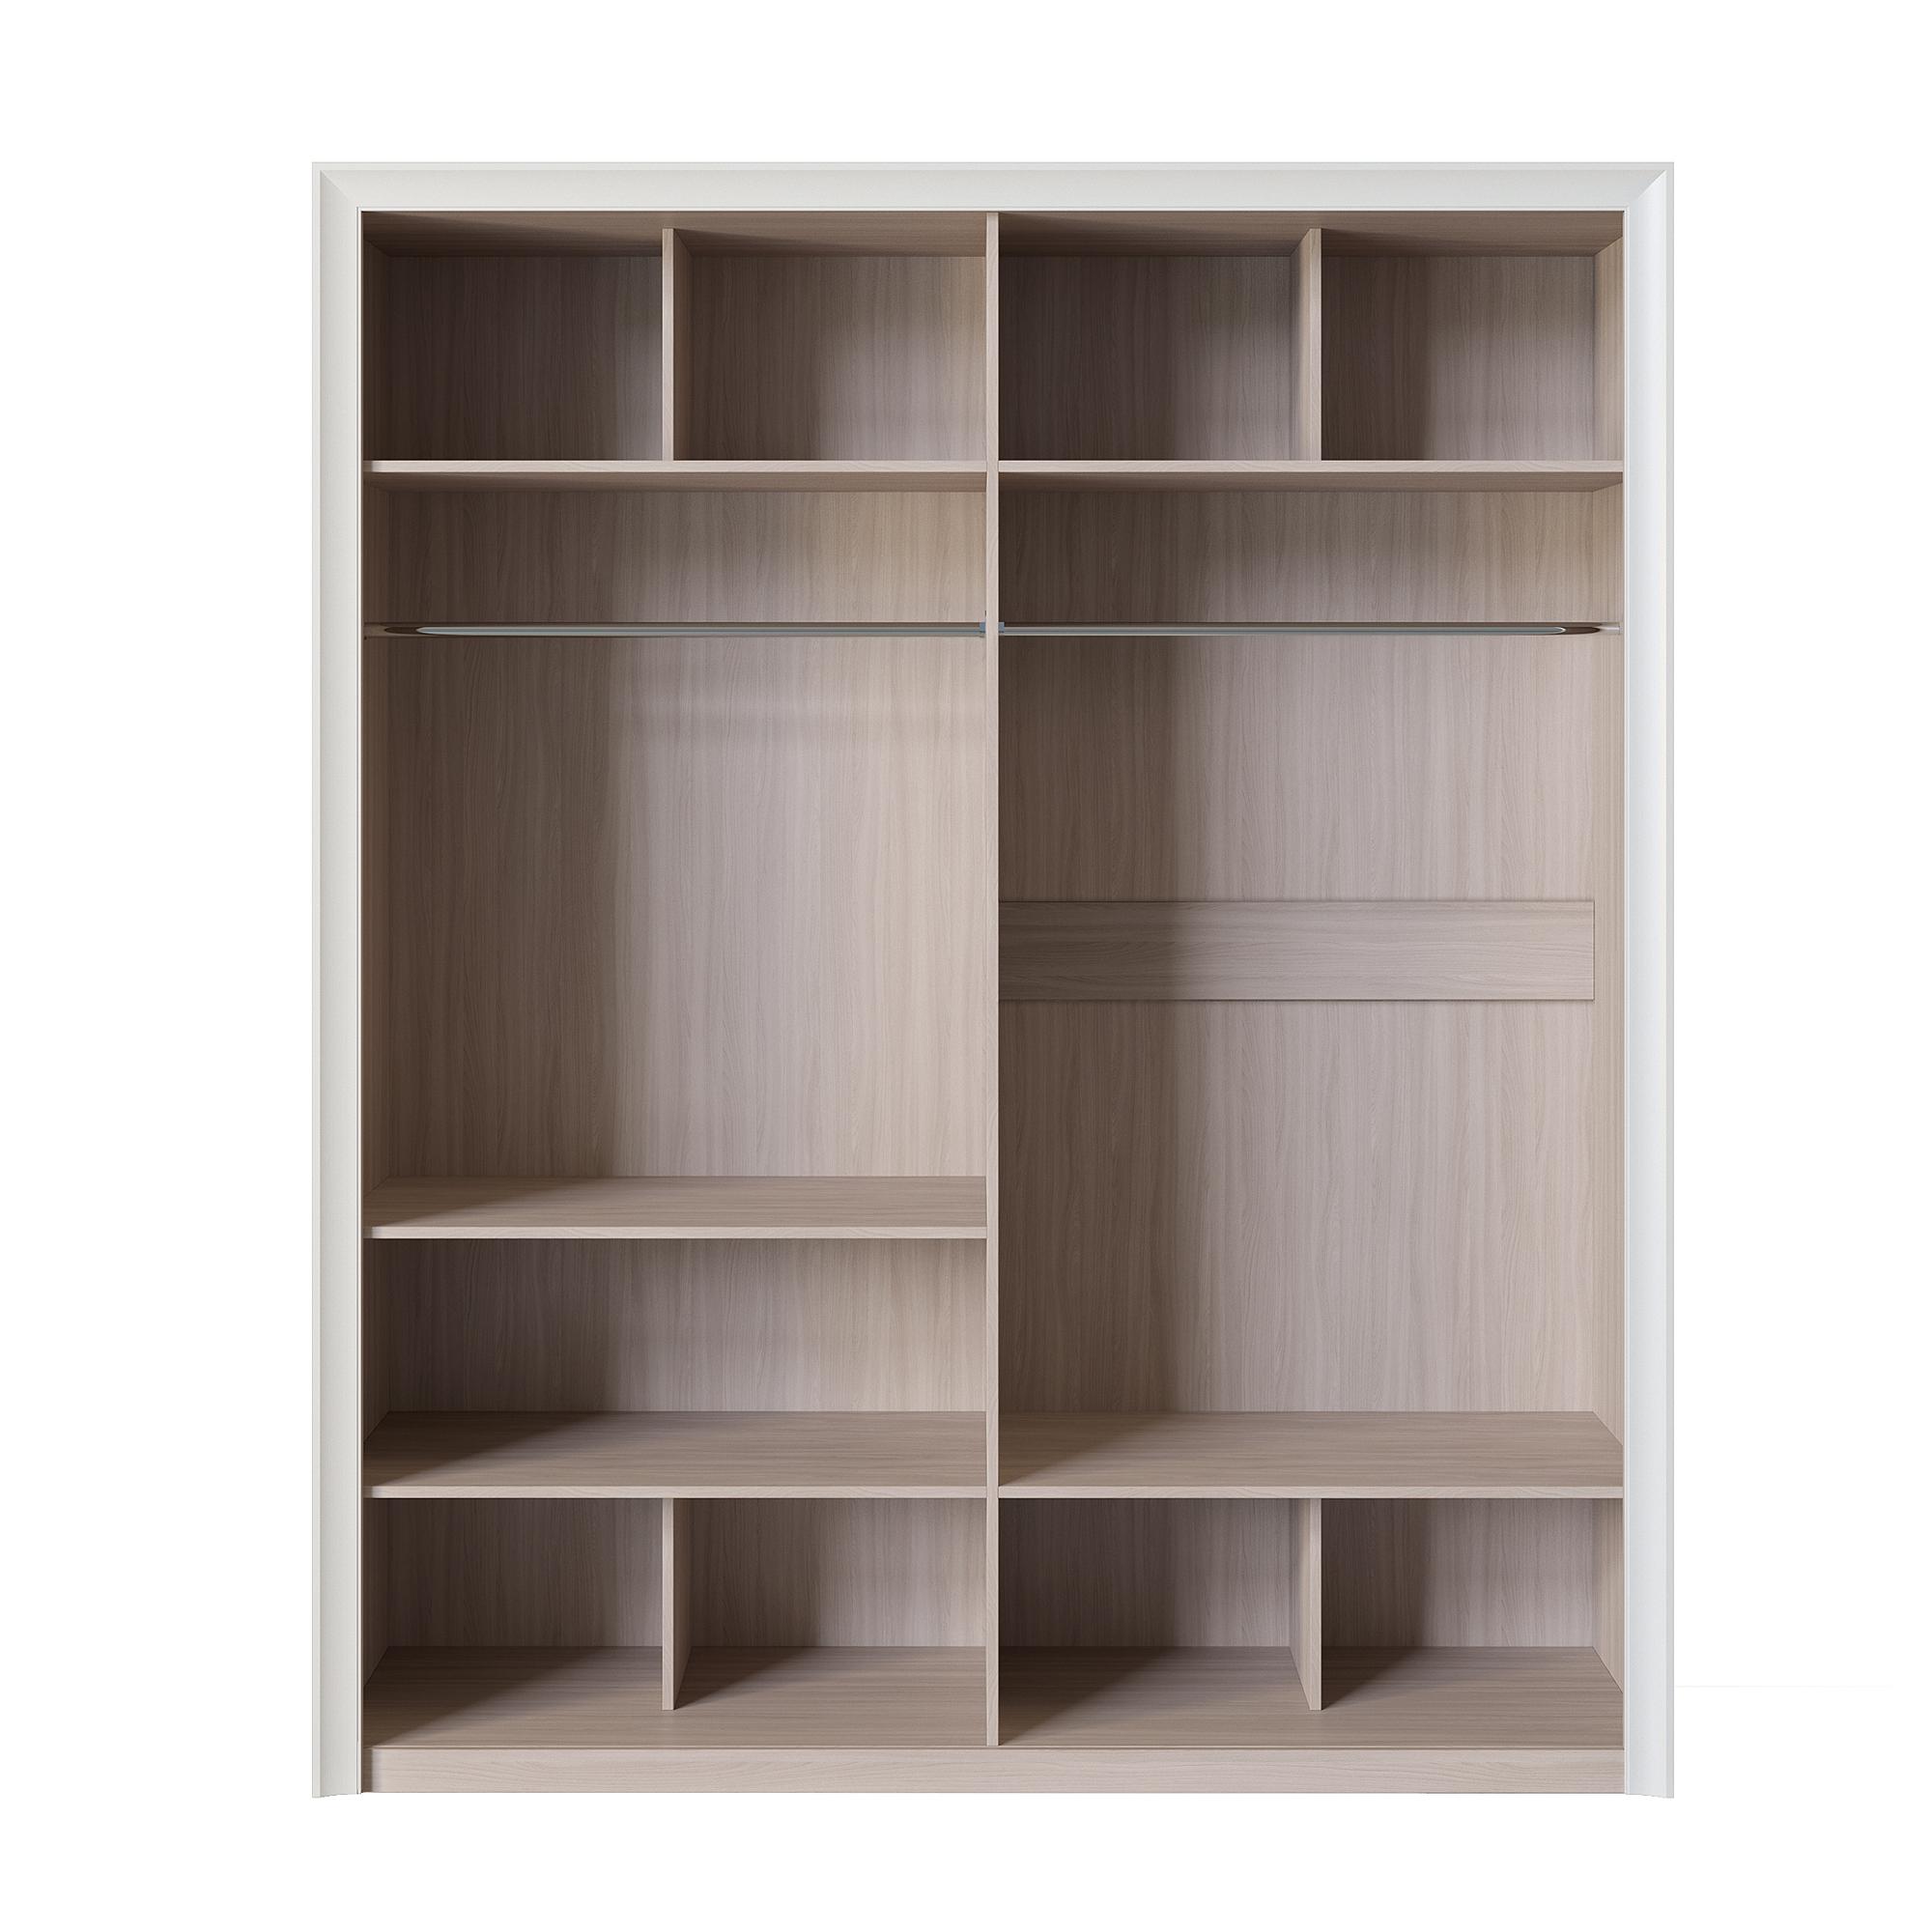 Шкаф четырёхдверный (корпус) «Прато» Кураж